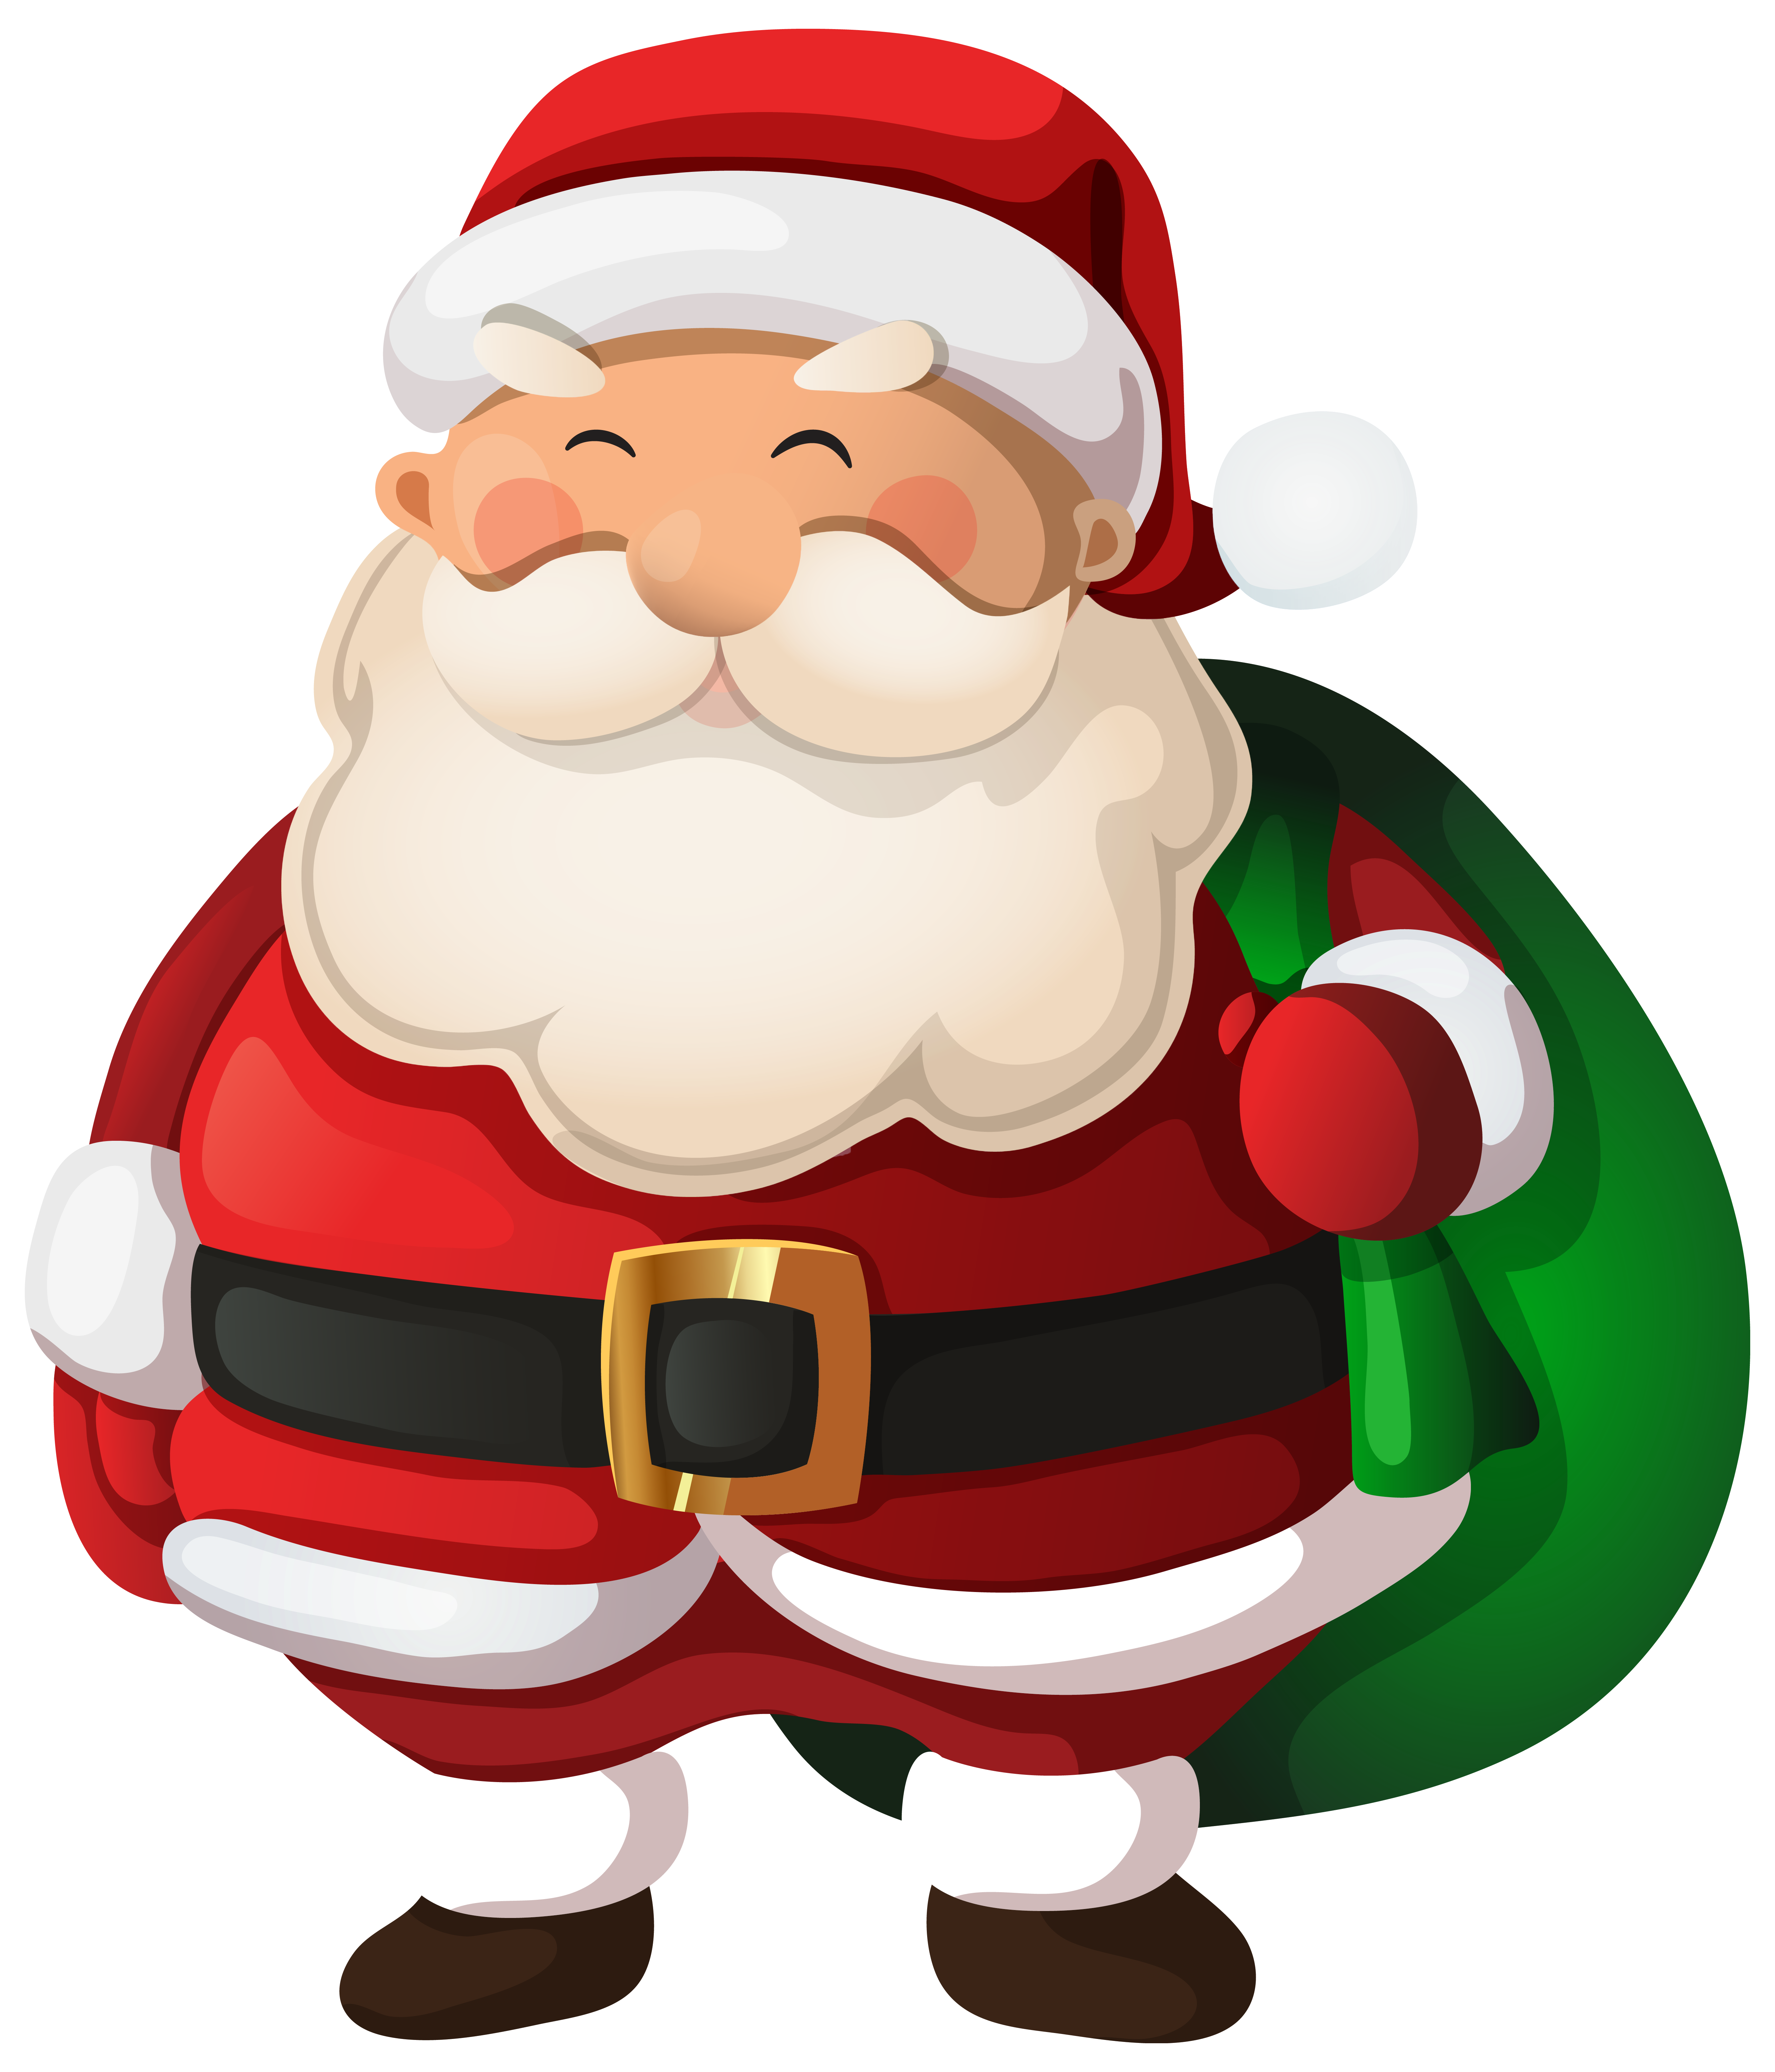 Santa Claus PNG Clip Art Image.